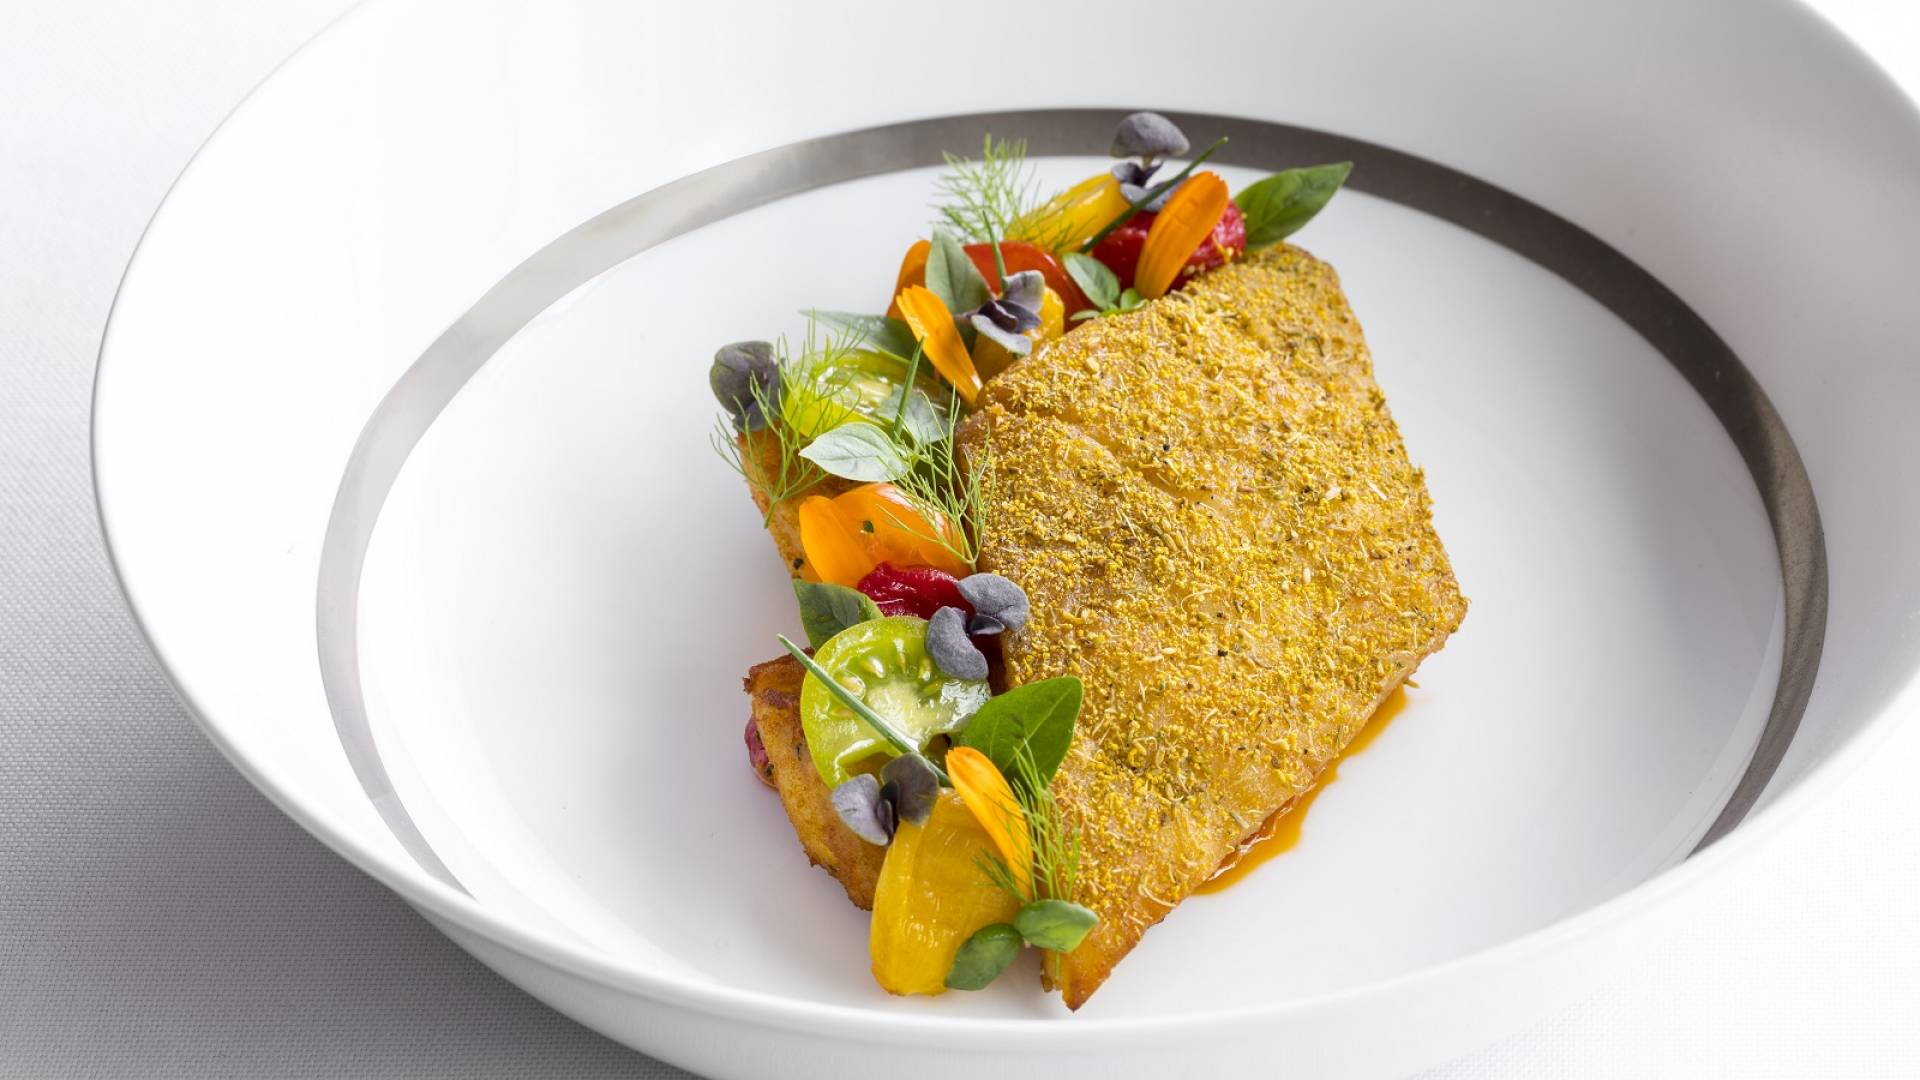 Gallery restaurant gordon ramsay gordon ramsay restaurants - Gordon ramsay cuisine cool ...